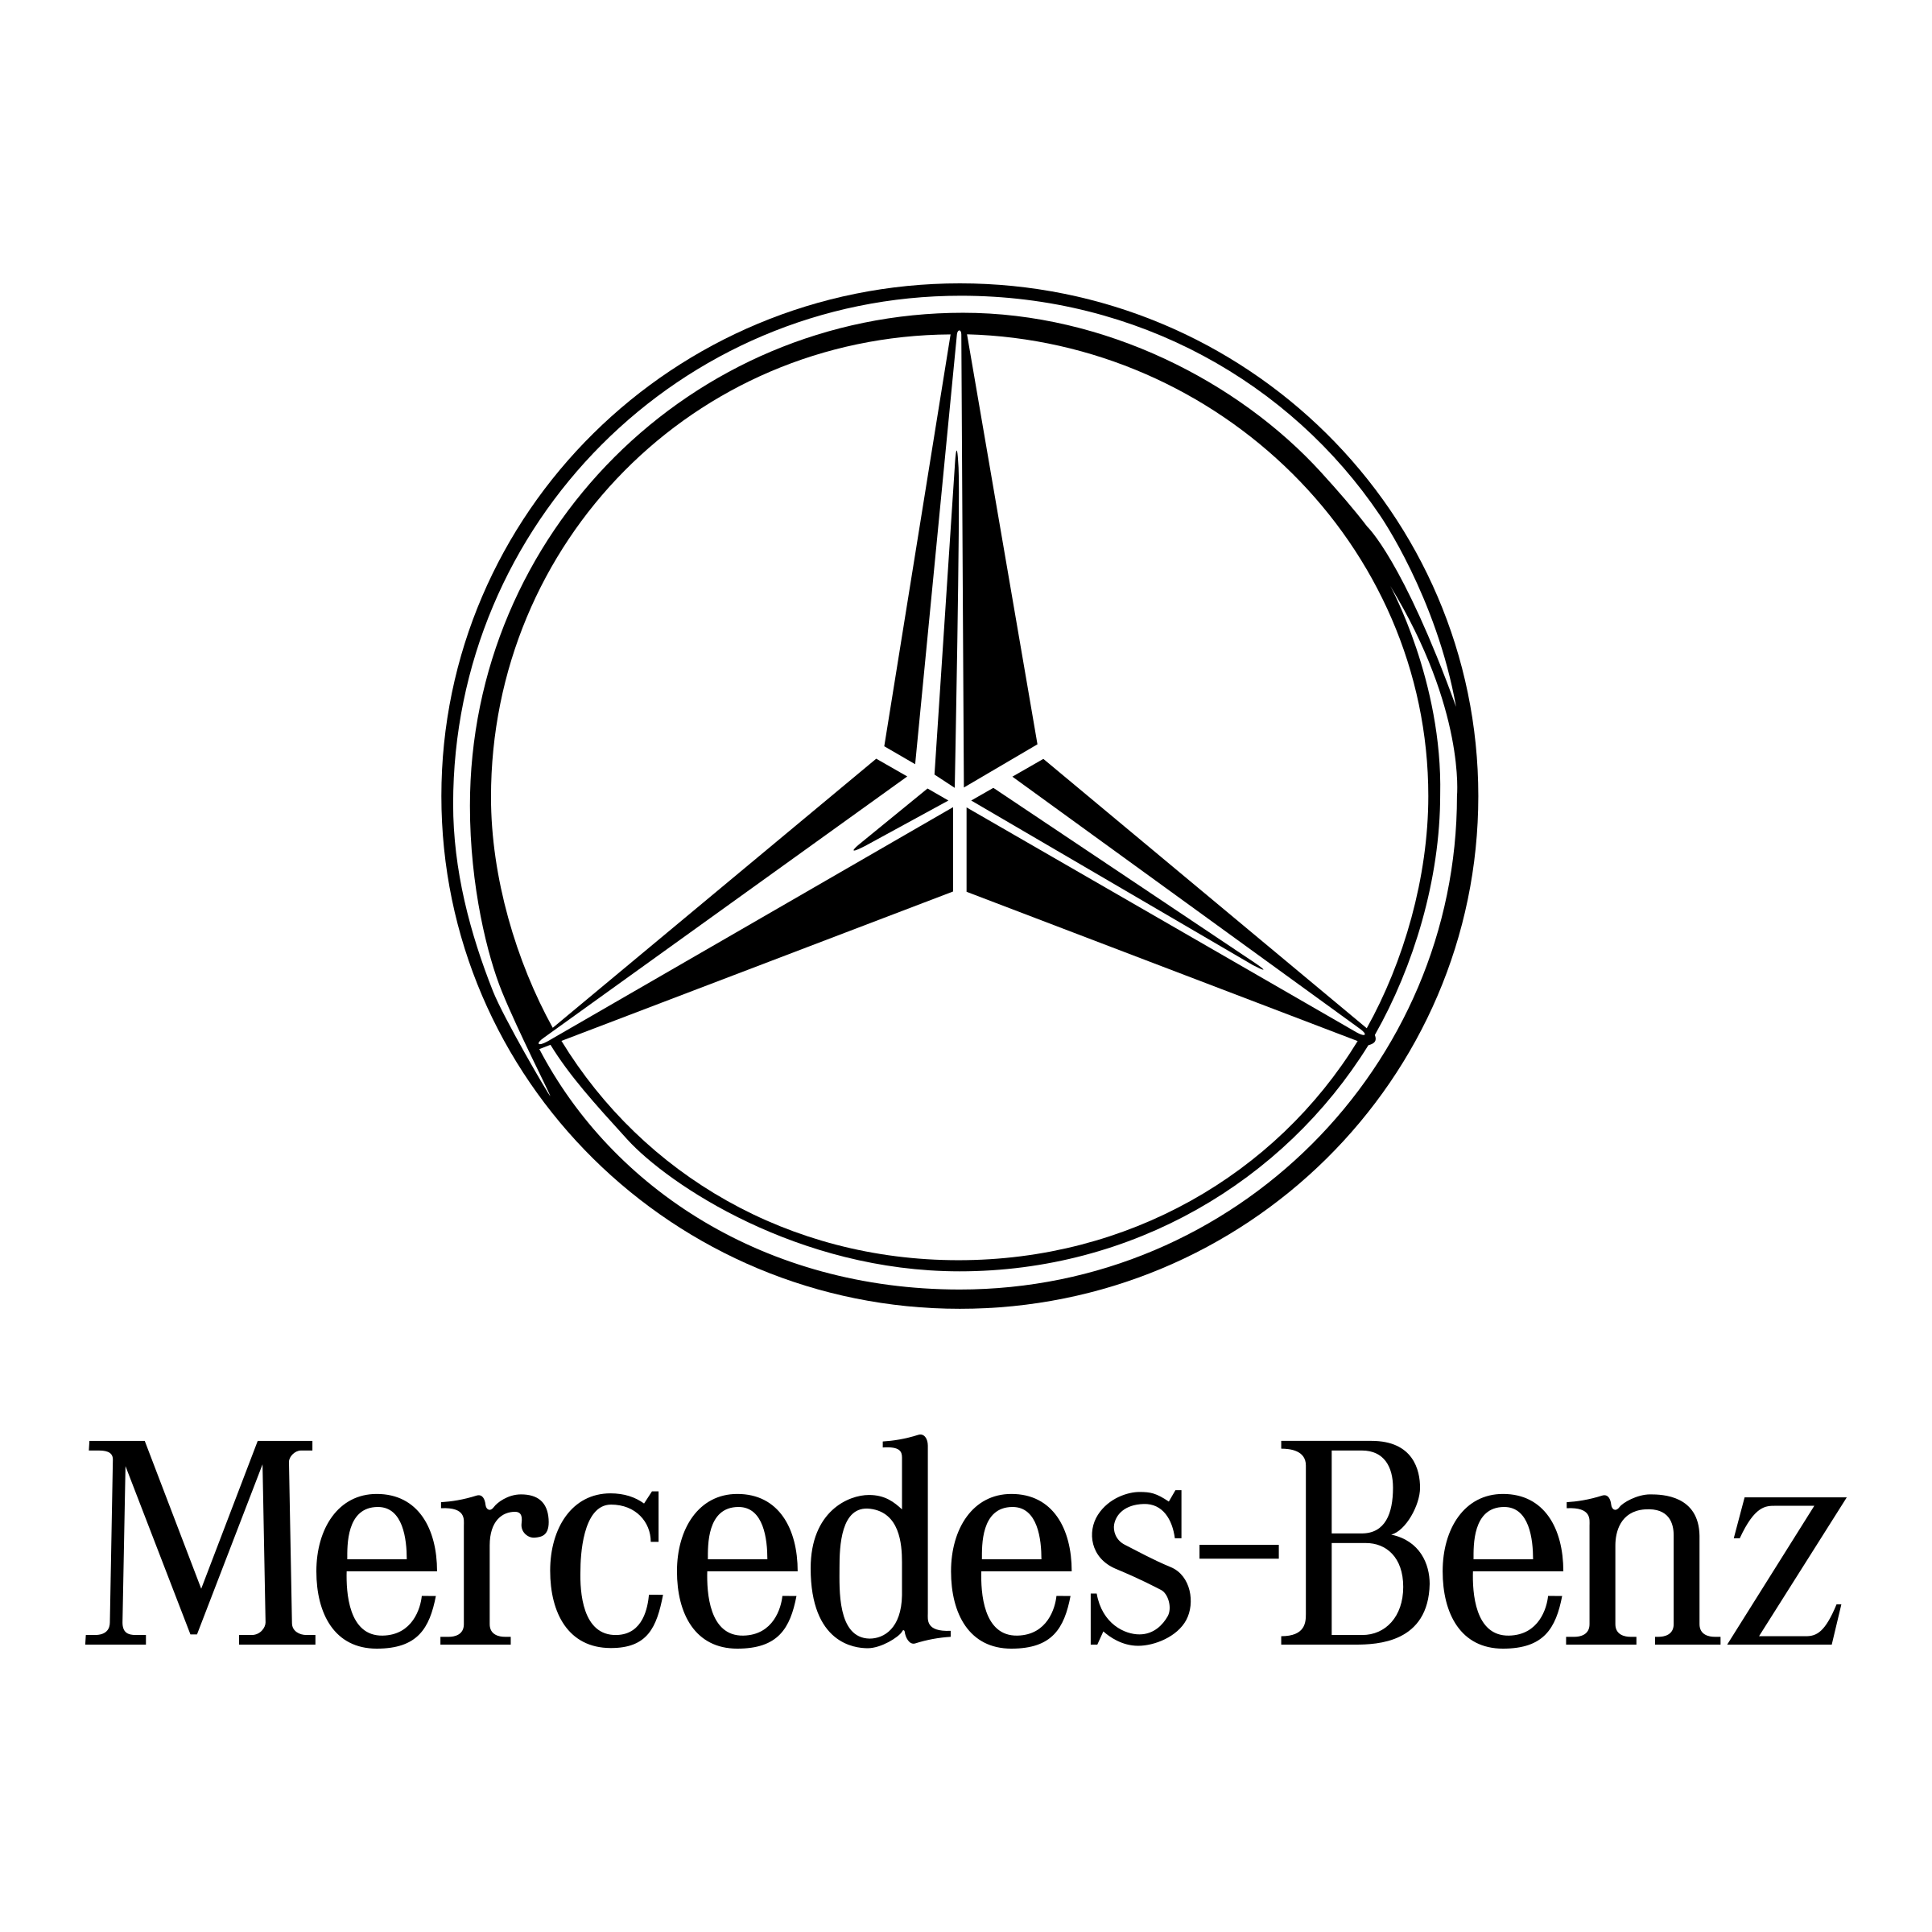 Mercedes Benz Logo Png Transparent Svg Vector Freebie Supply